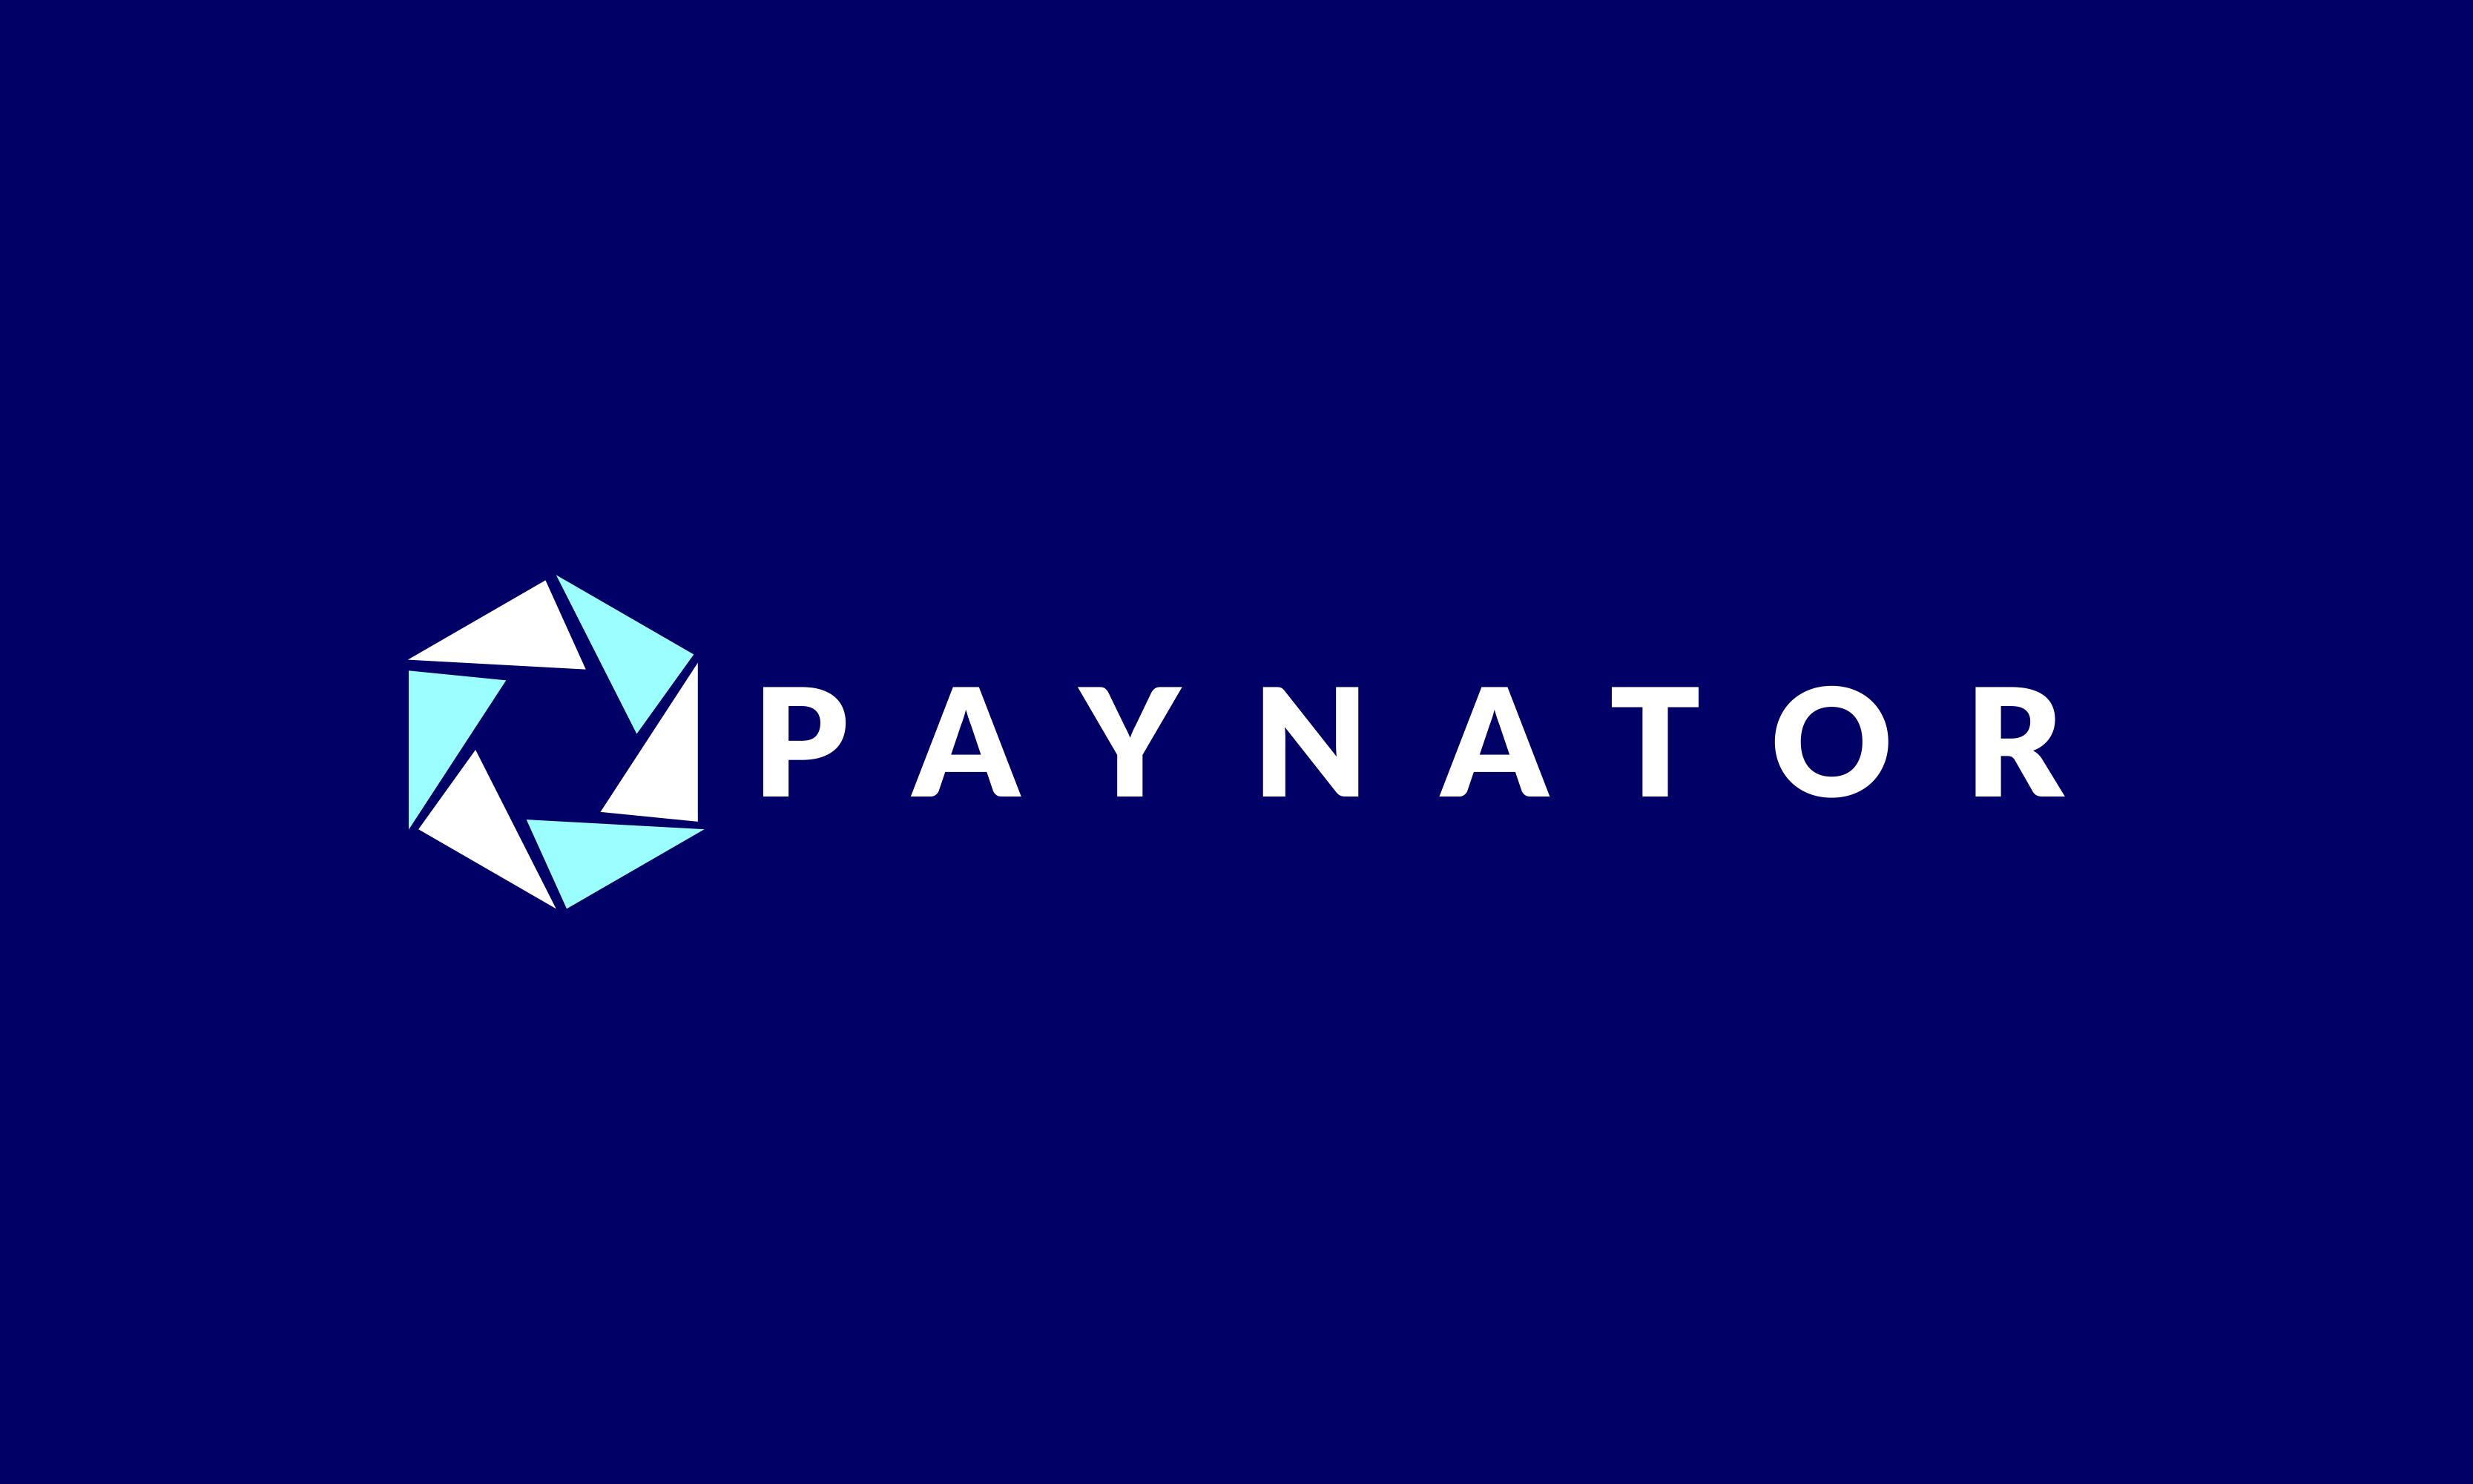 Paynator